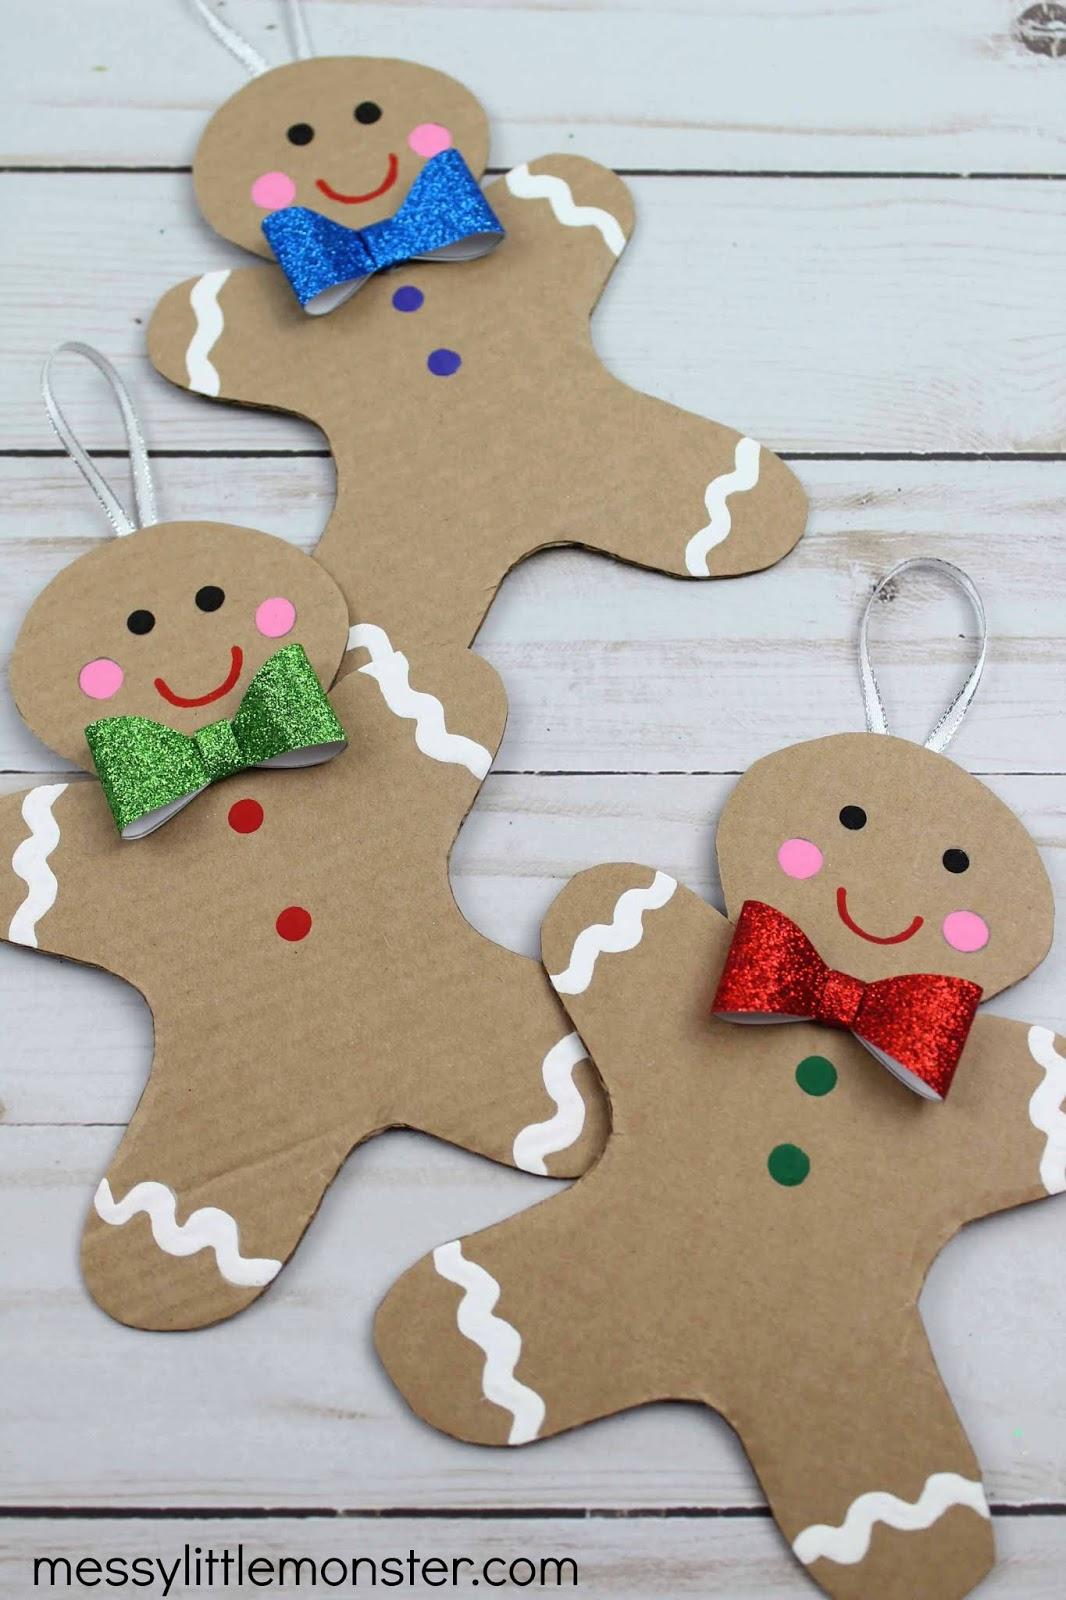 Cardboard Gingerbread Man Craft Template Included